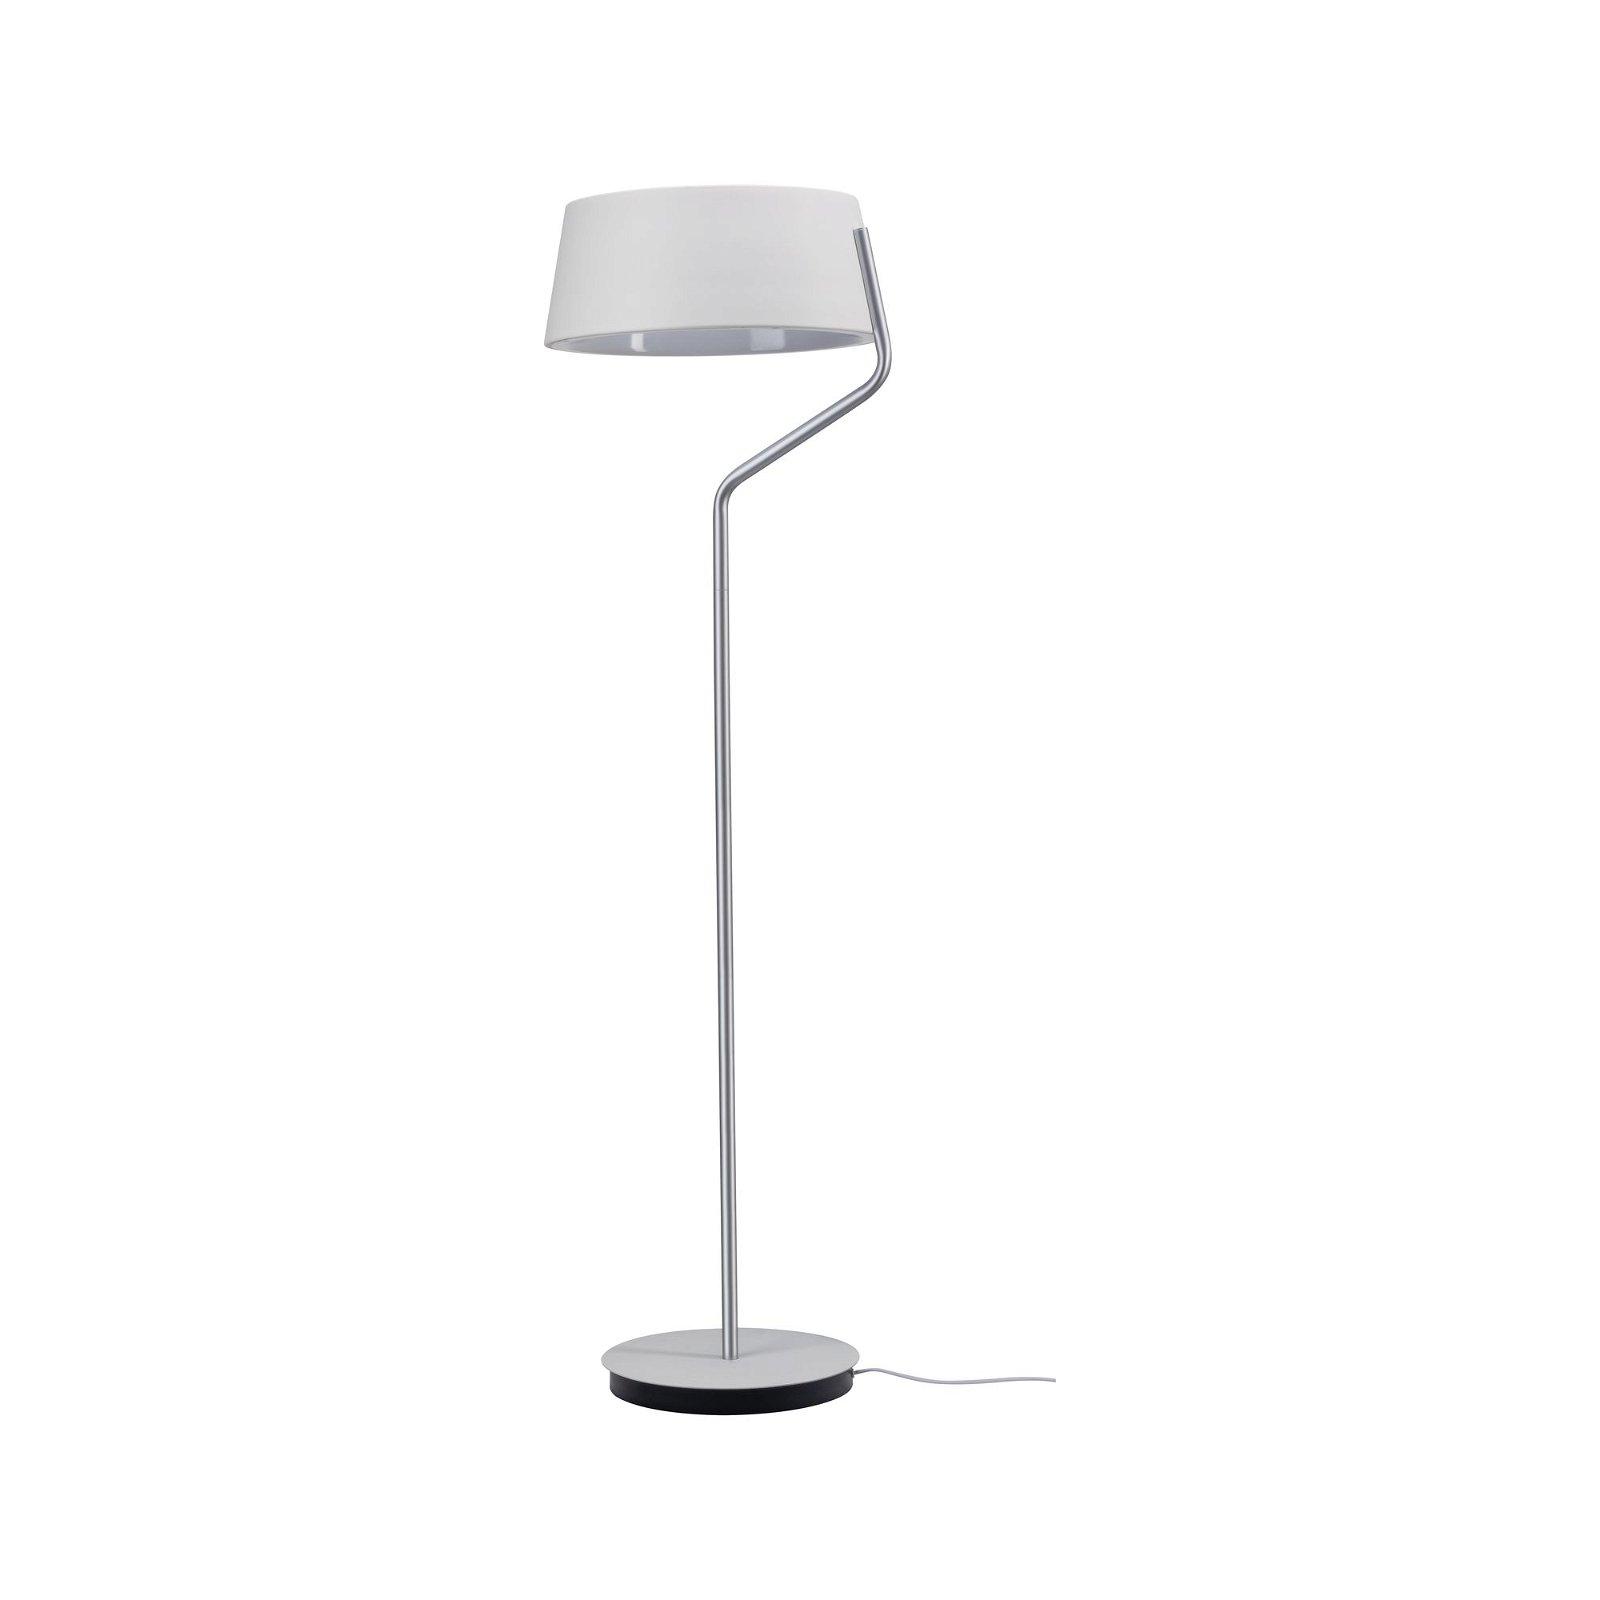 Lampadaire LED Belaja 2700K 2850lm 22W Blanc/Chrome mat